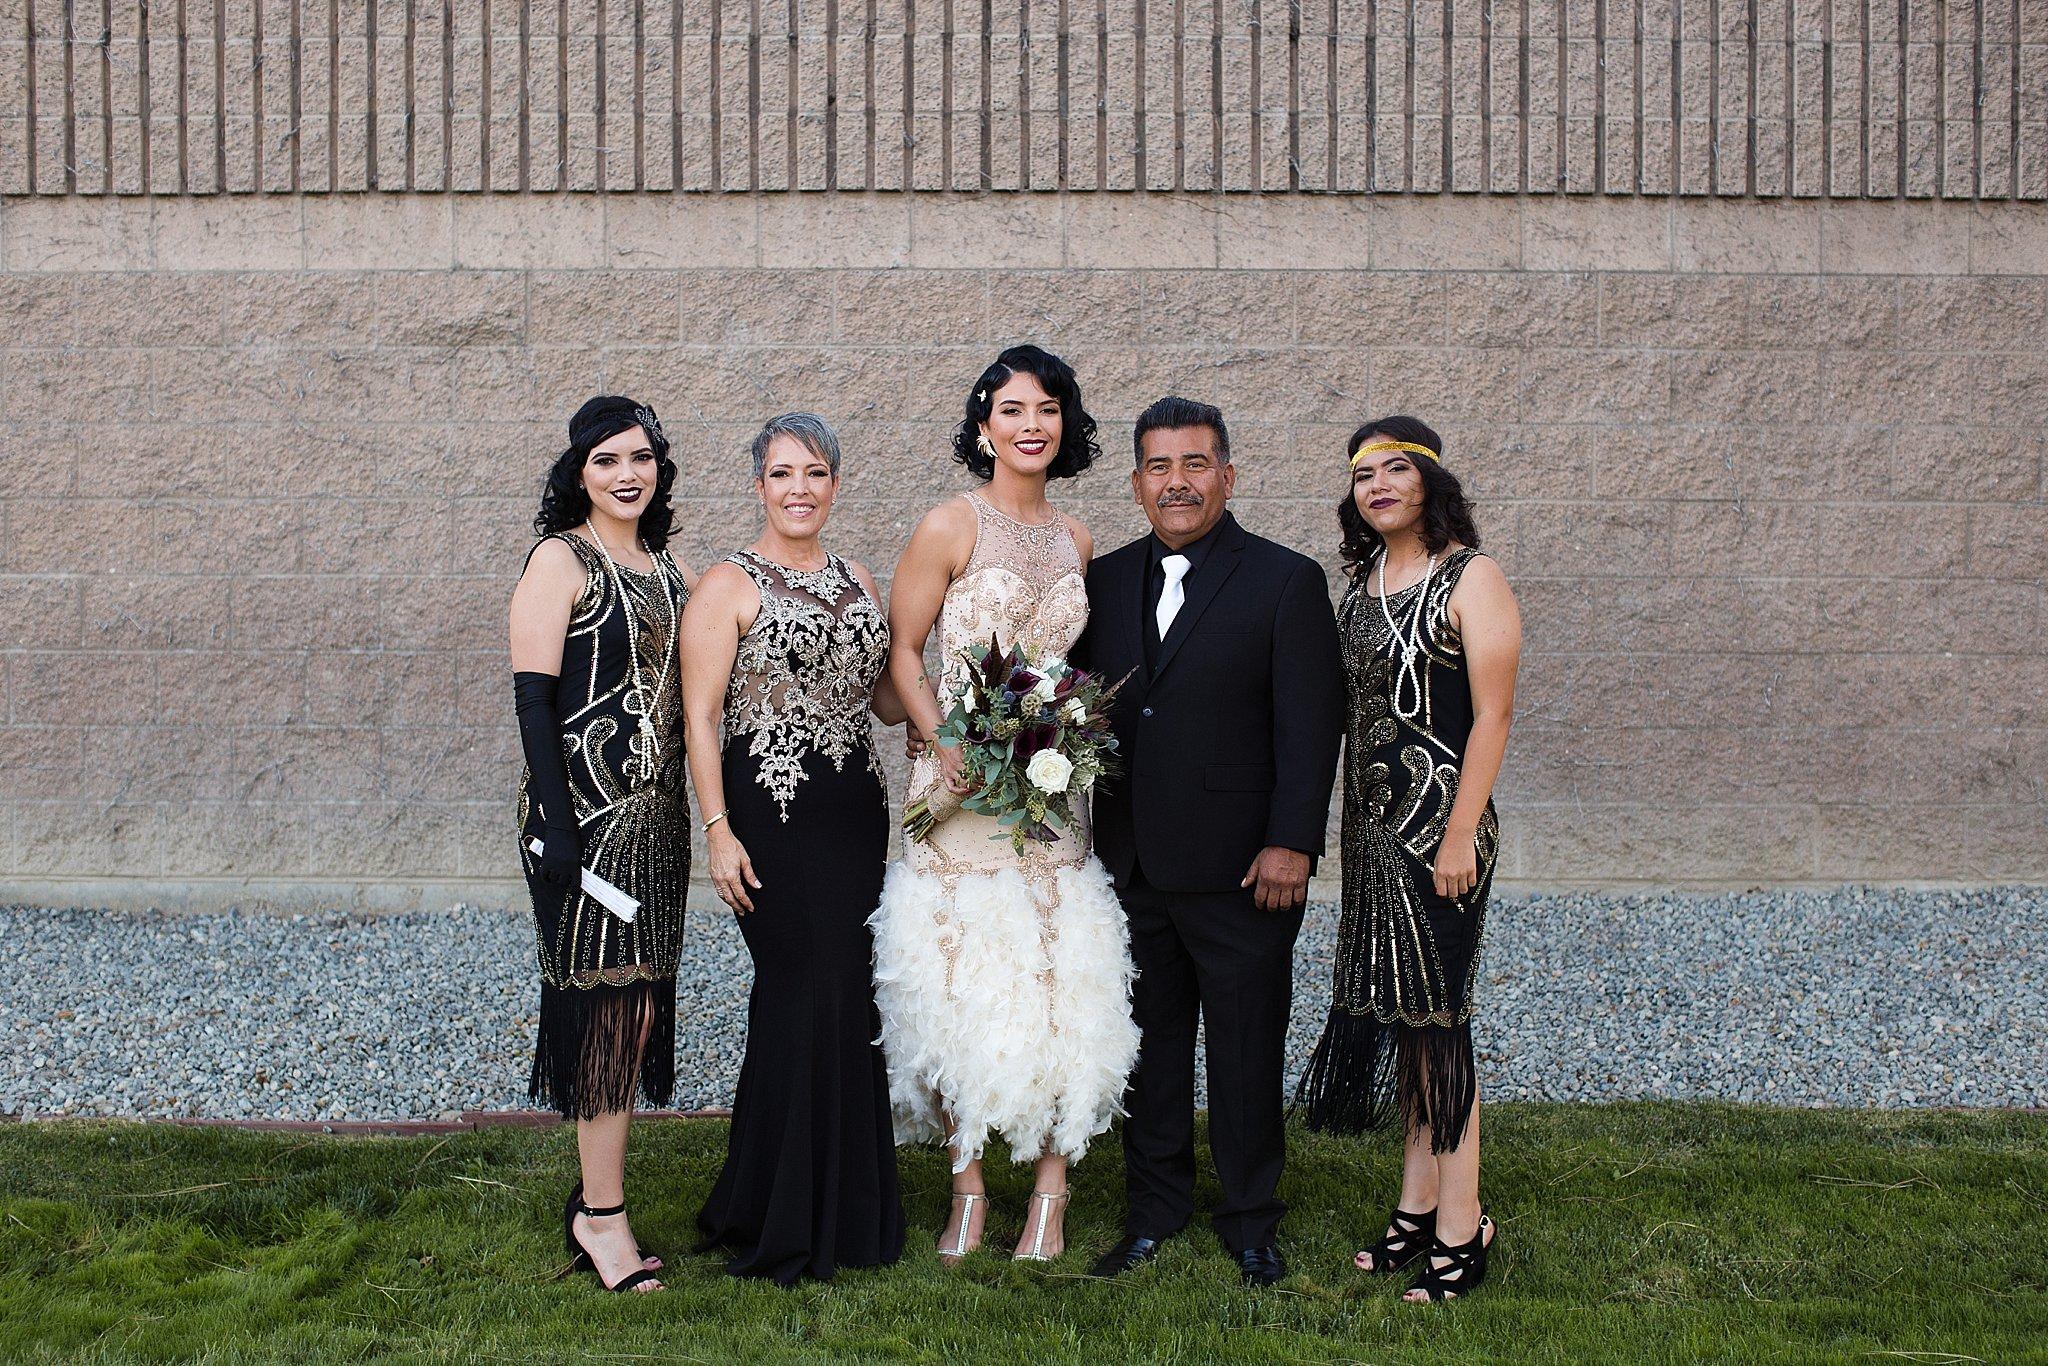 Yesenia-Bruce-Wedding-2017-4619.jpg